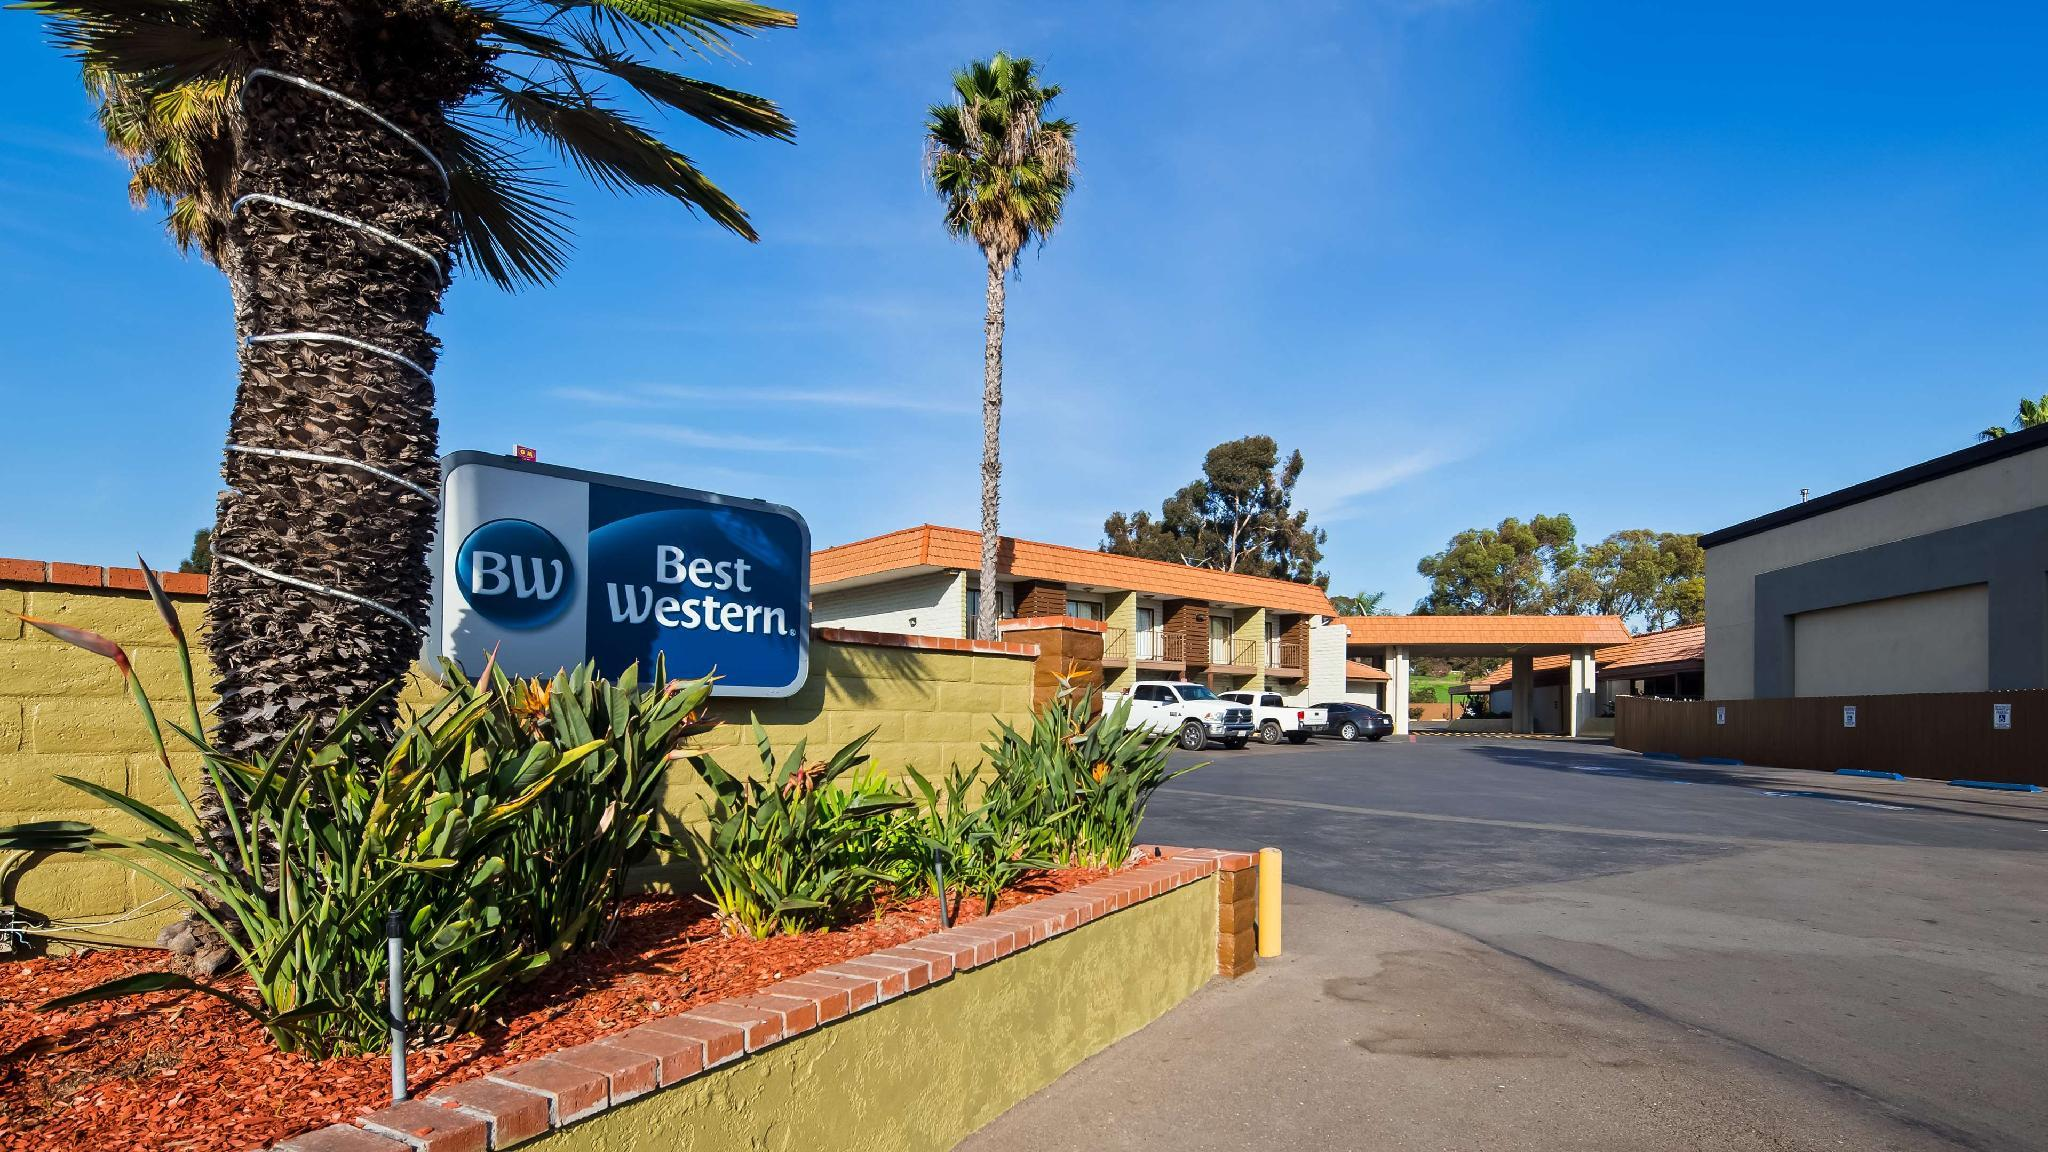 Best Western Oceanside Inn